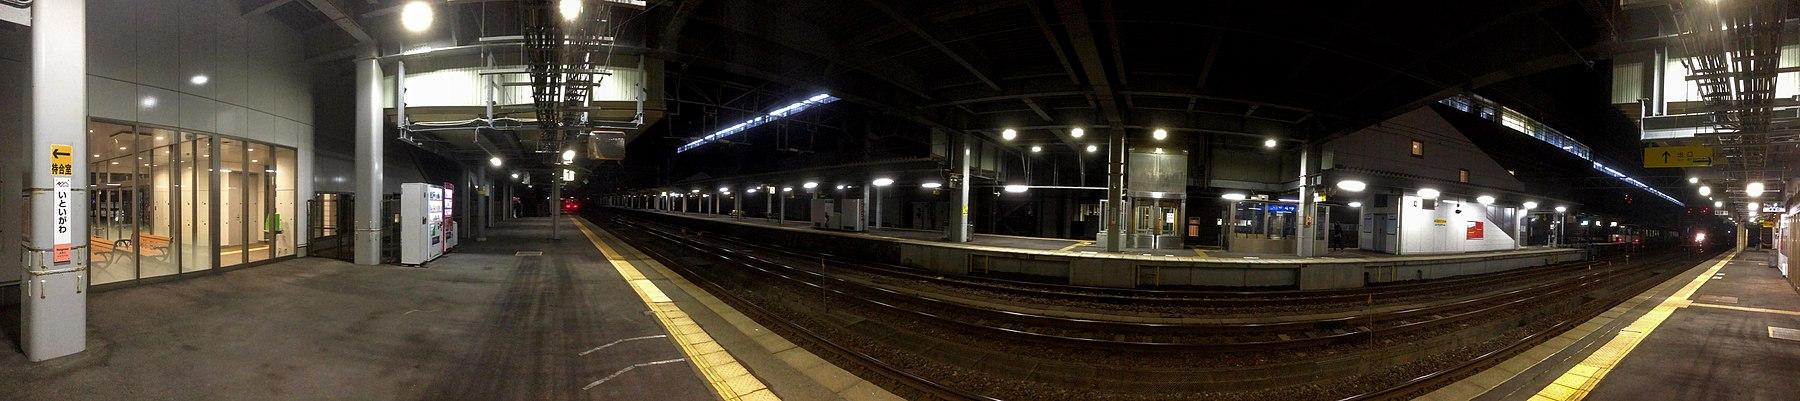 ETR Itoigawa Station Horm.jpg